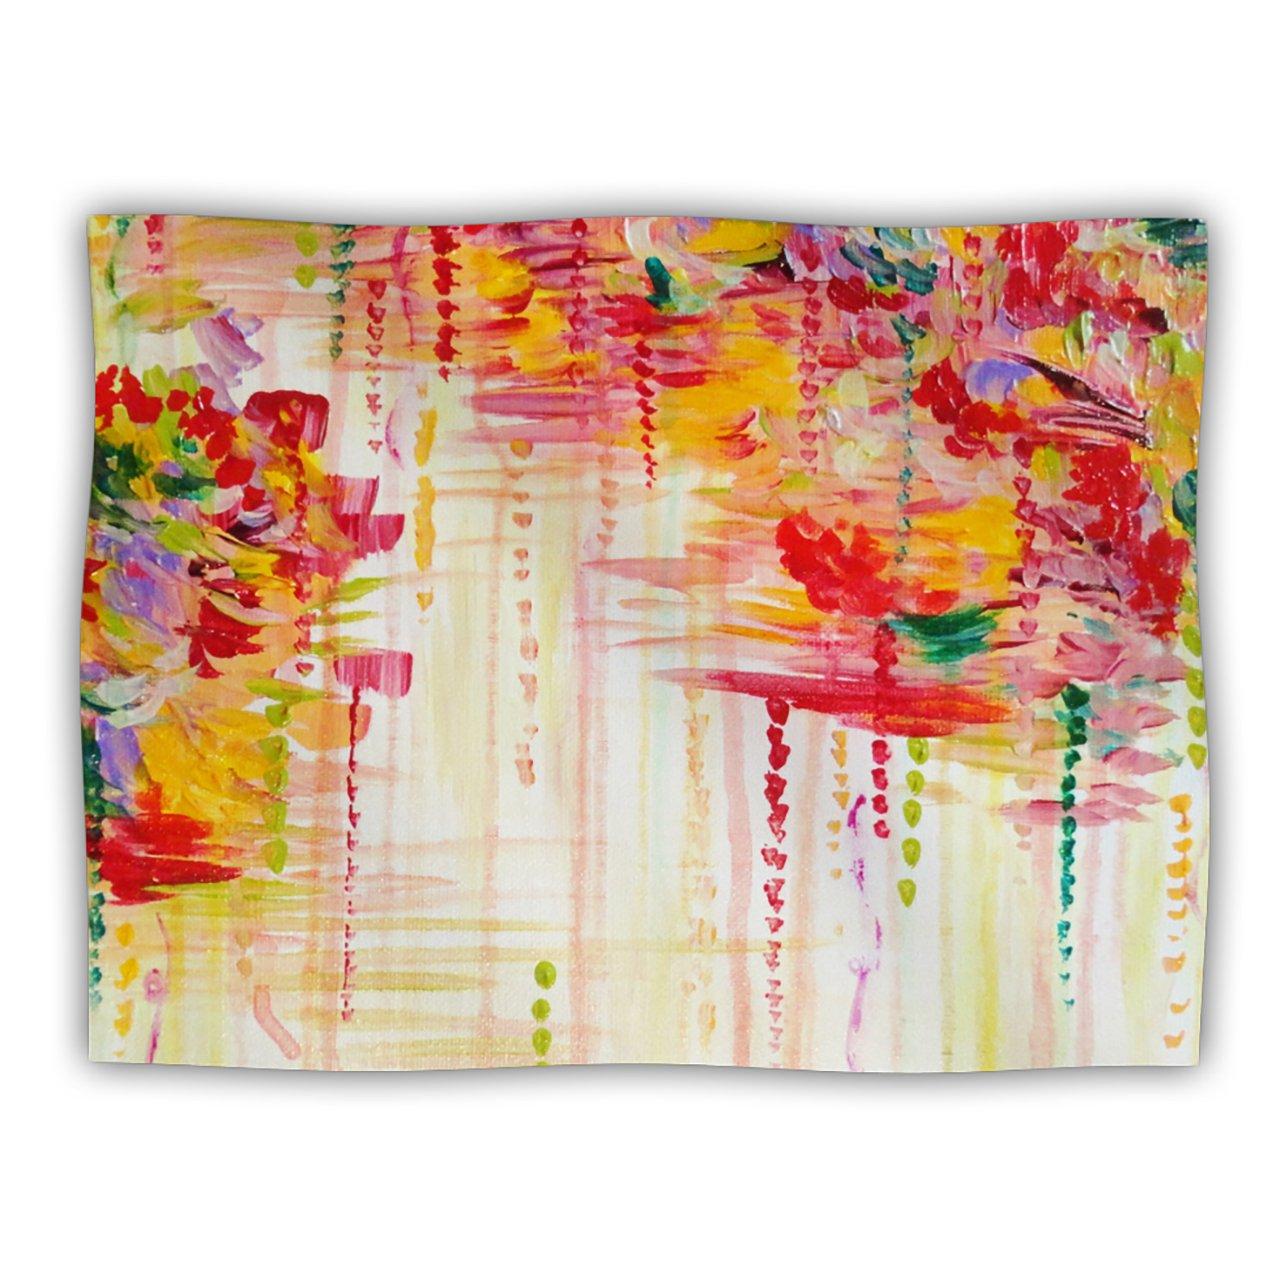 Kess InHouse EBI Emporium Stormy Moods Pet Blanket, 40 by 30-Inch